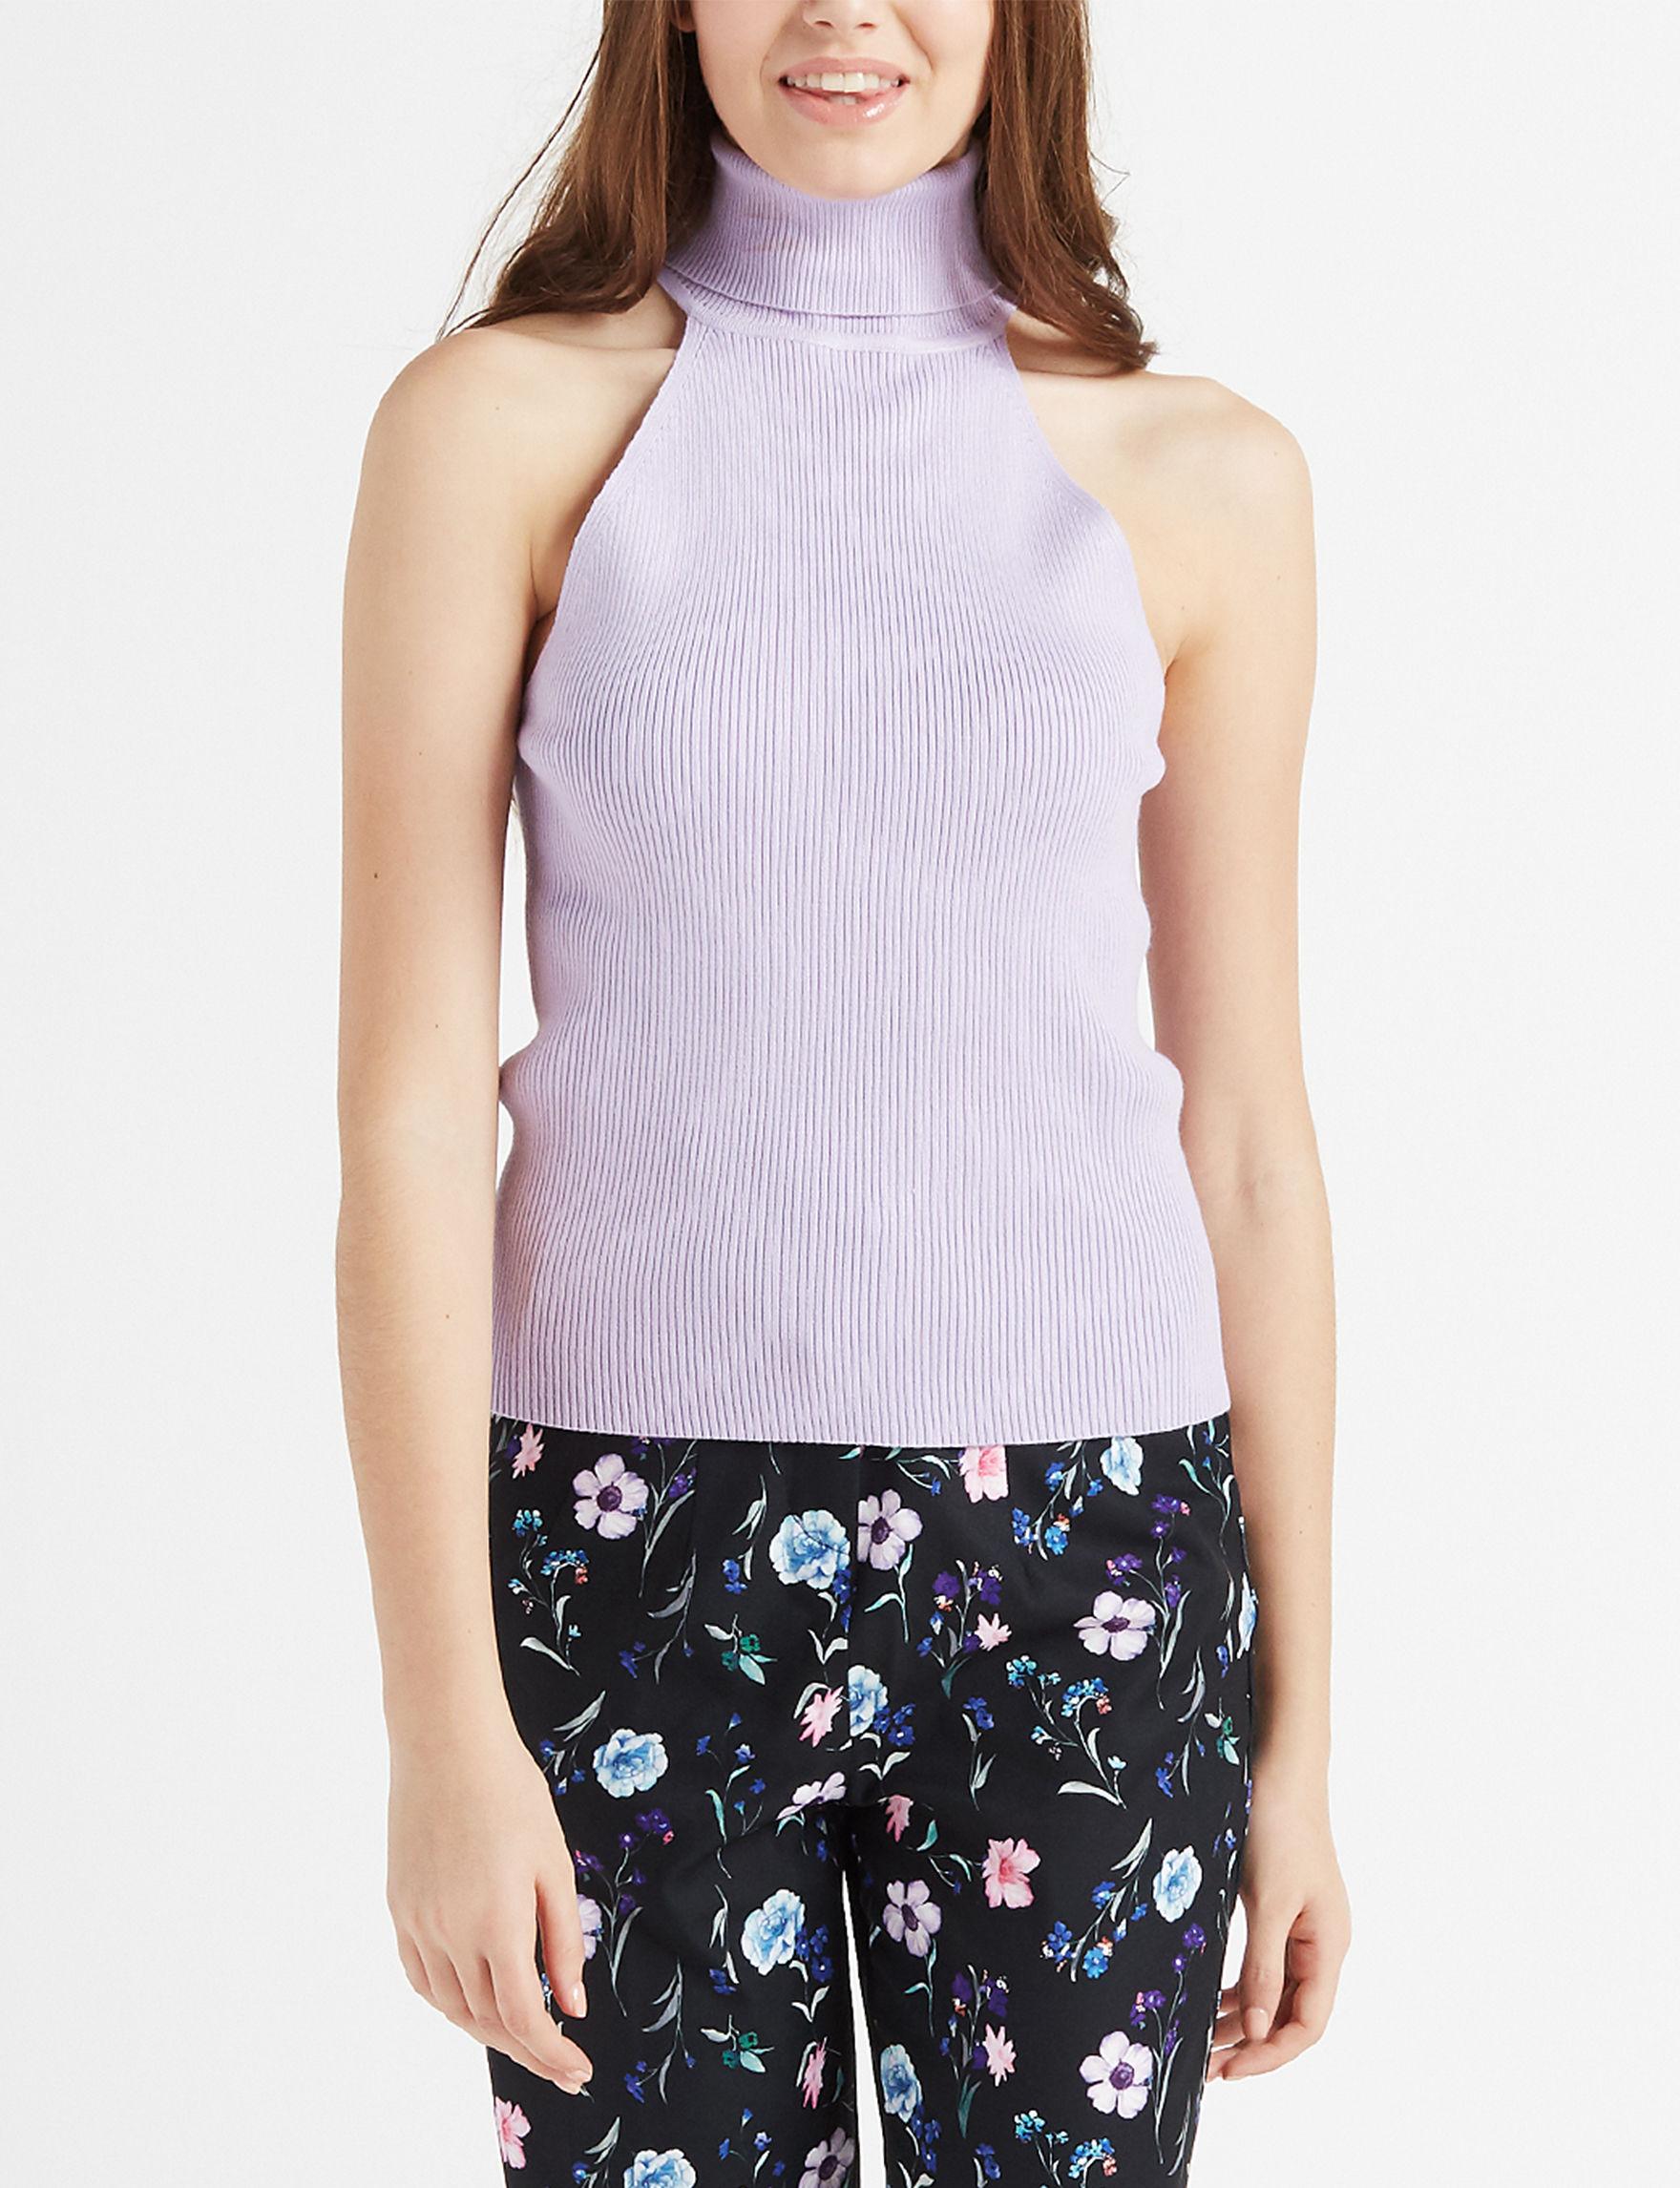 XOXO Lilac Shirts & Blouses